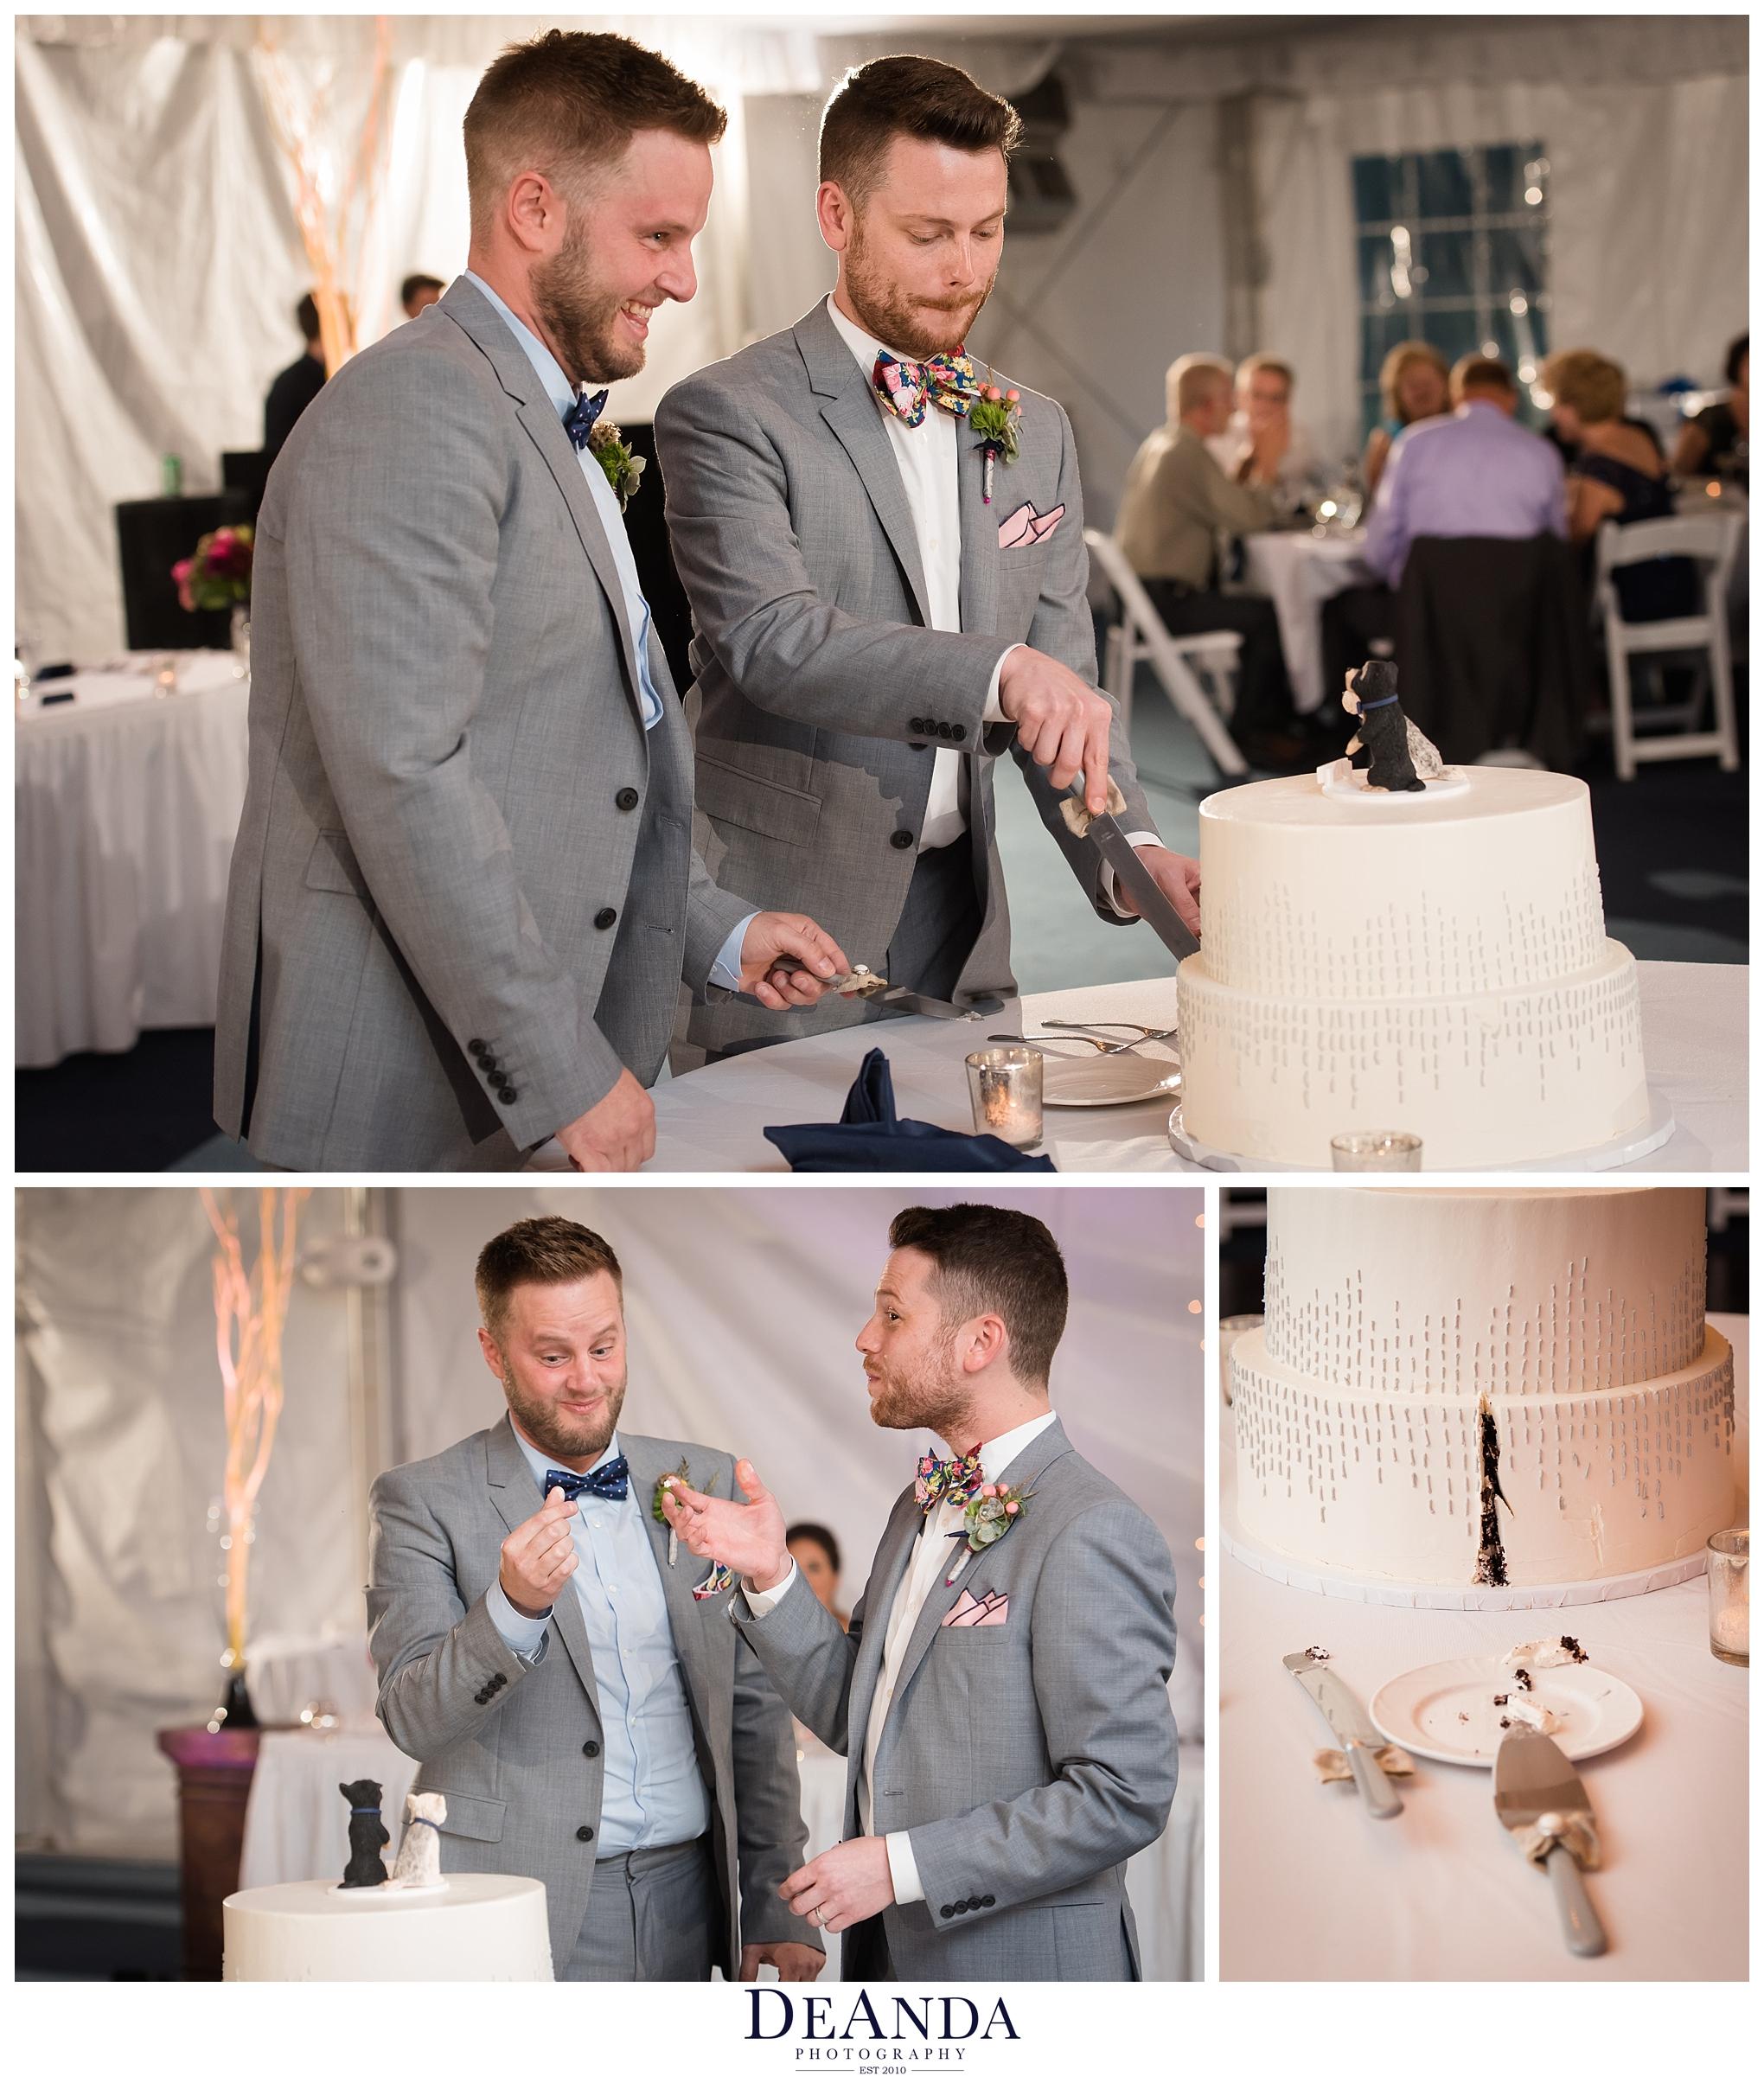 grooms cutting cake